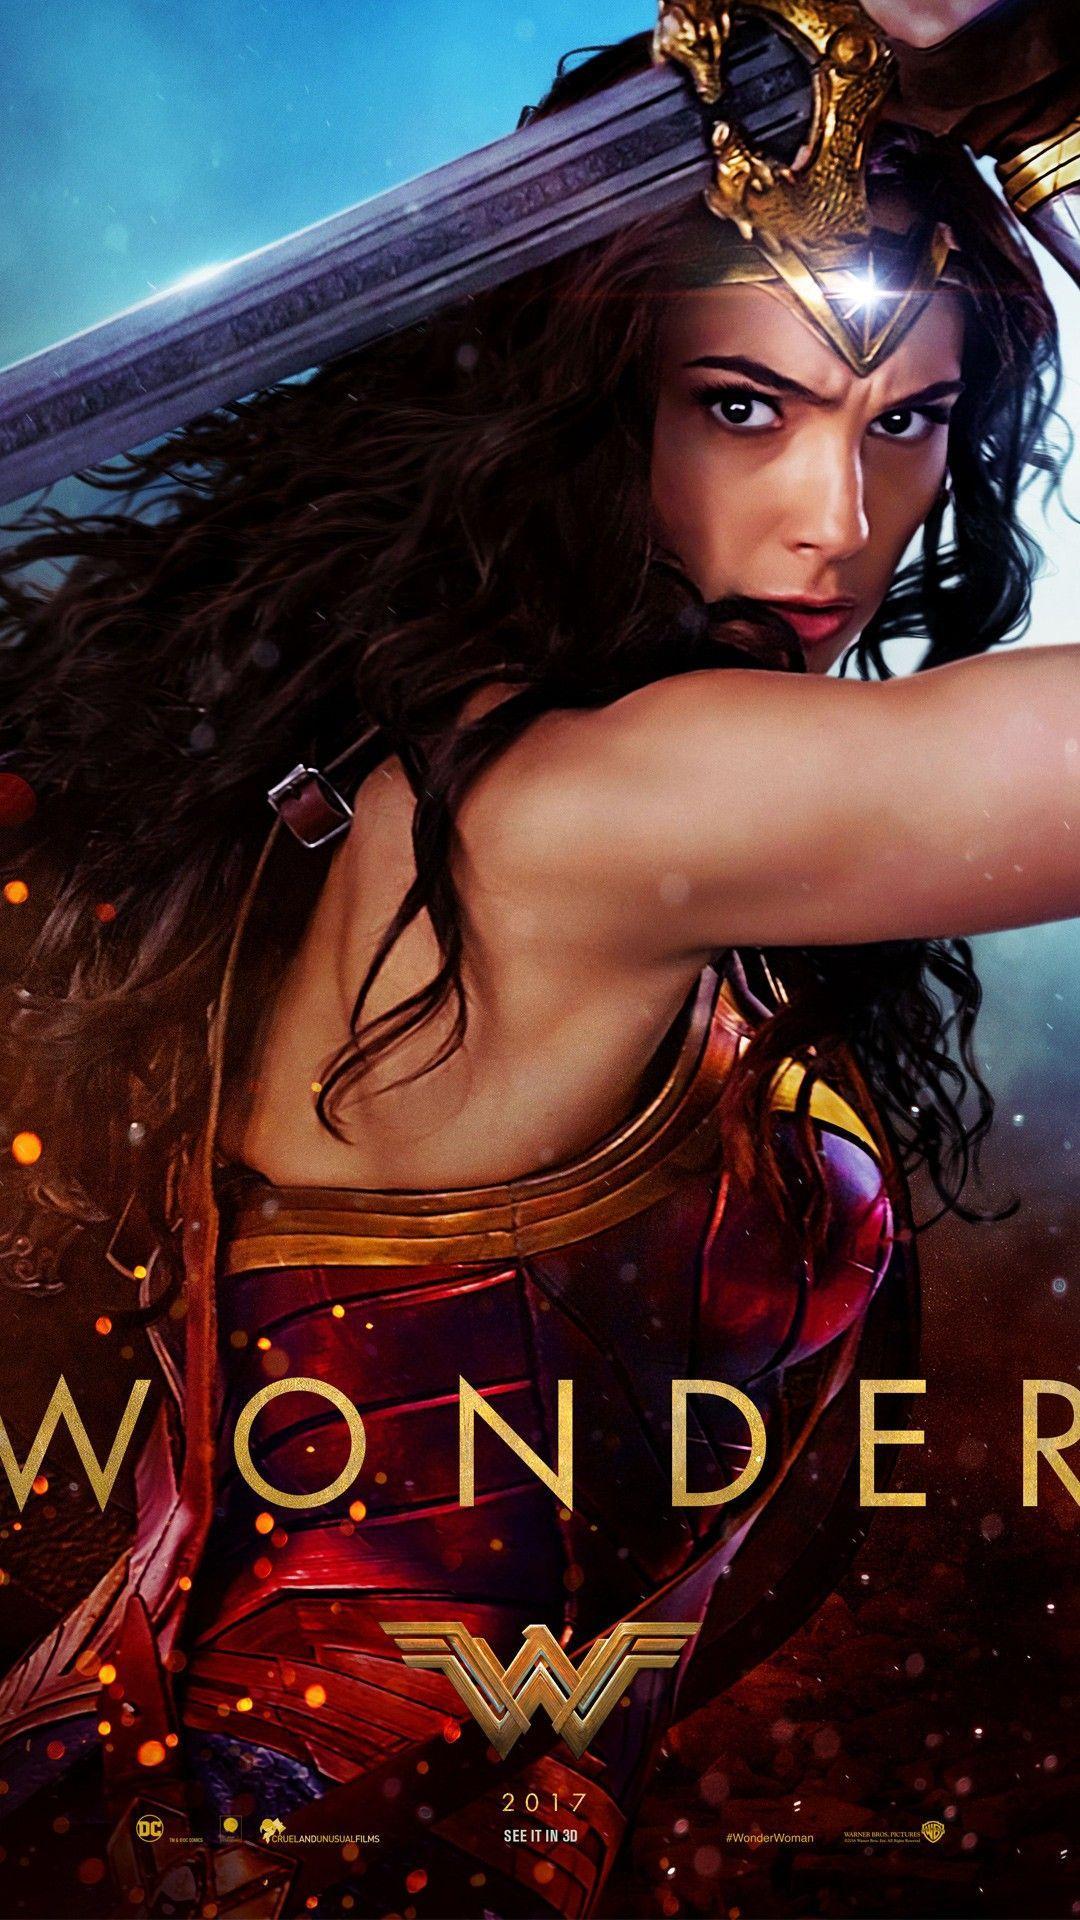 Wonder Woman Iphone Wallpapers Top Free Wonder Woman Iphone